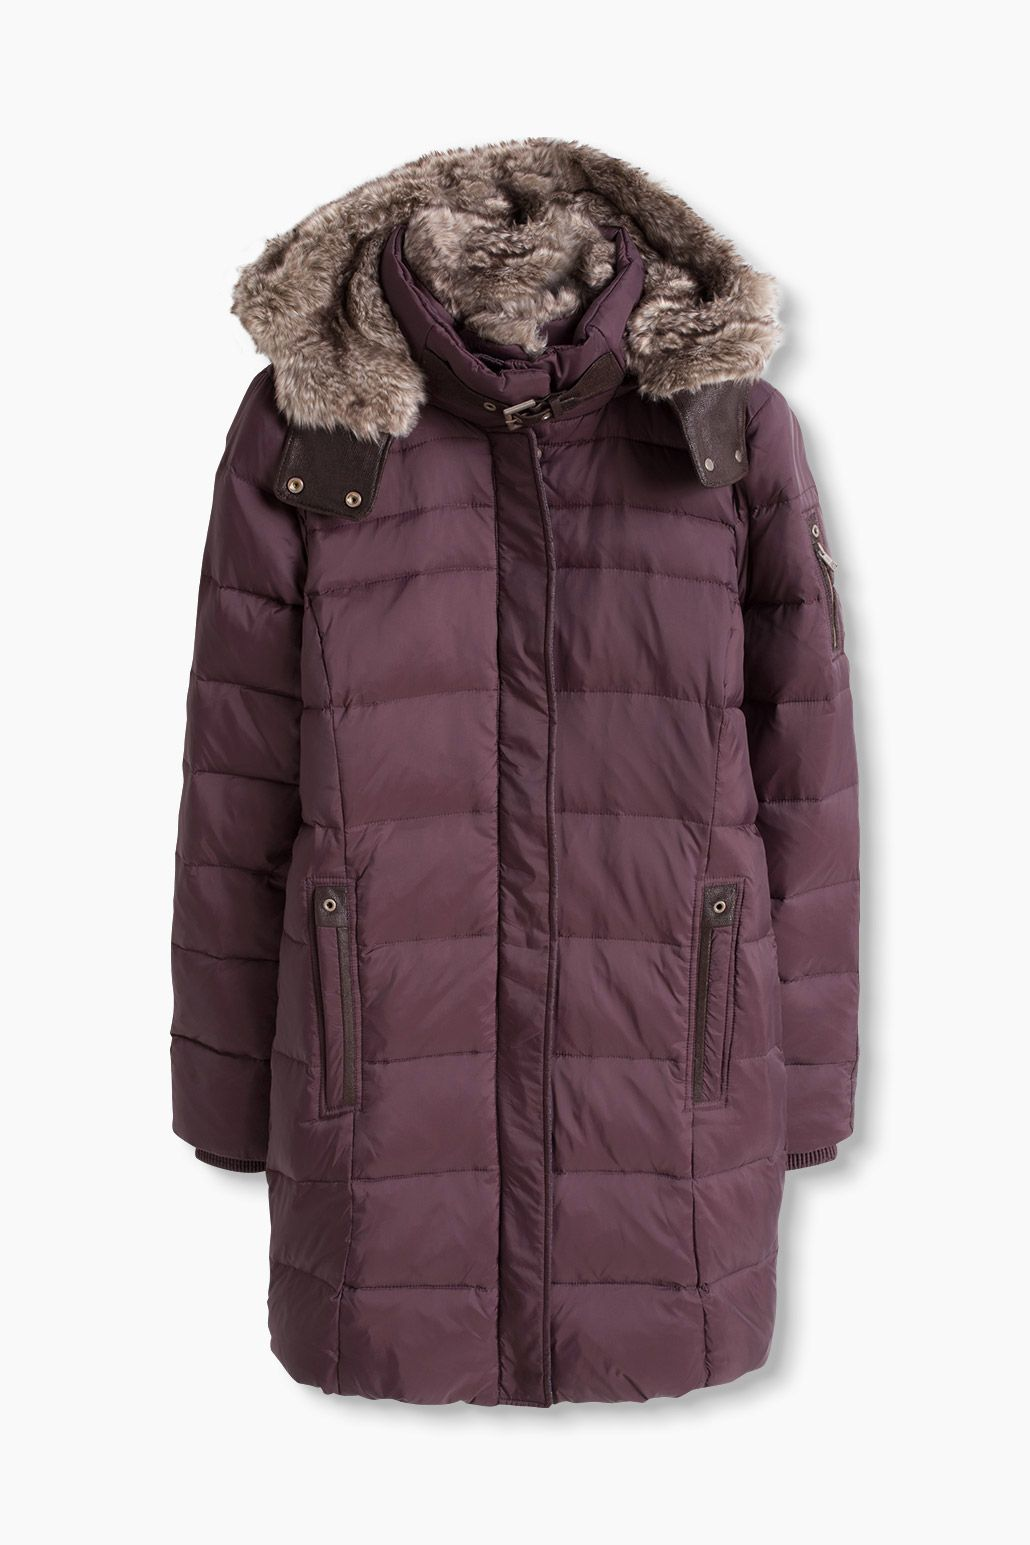 Esprit Feminine Down Coat Colorful Coat Coats Jackets Women Down Coat [ 1545 x 1030 Pixel ]